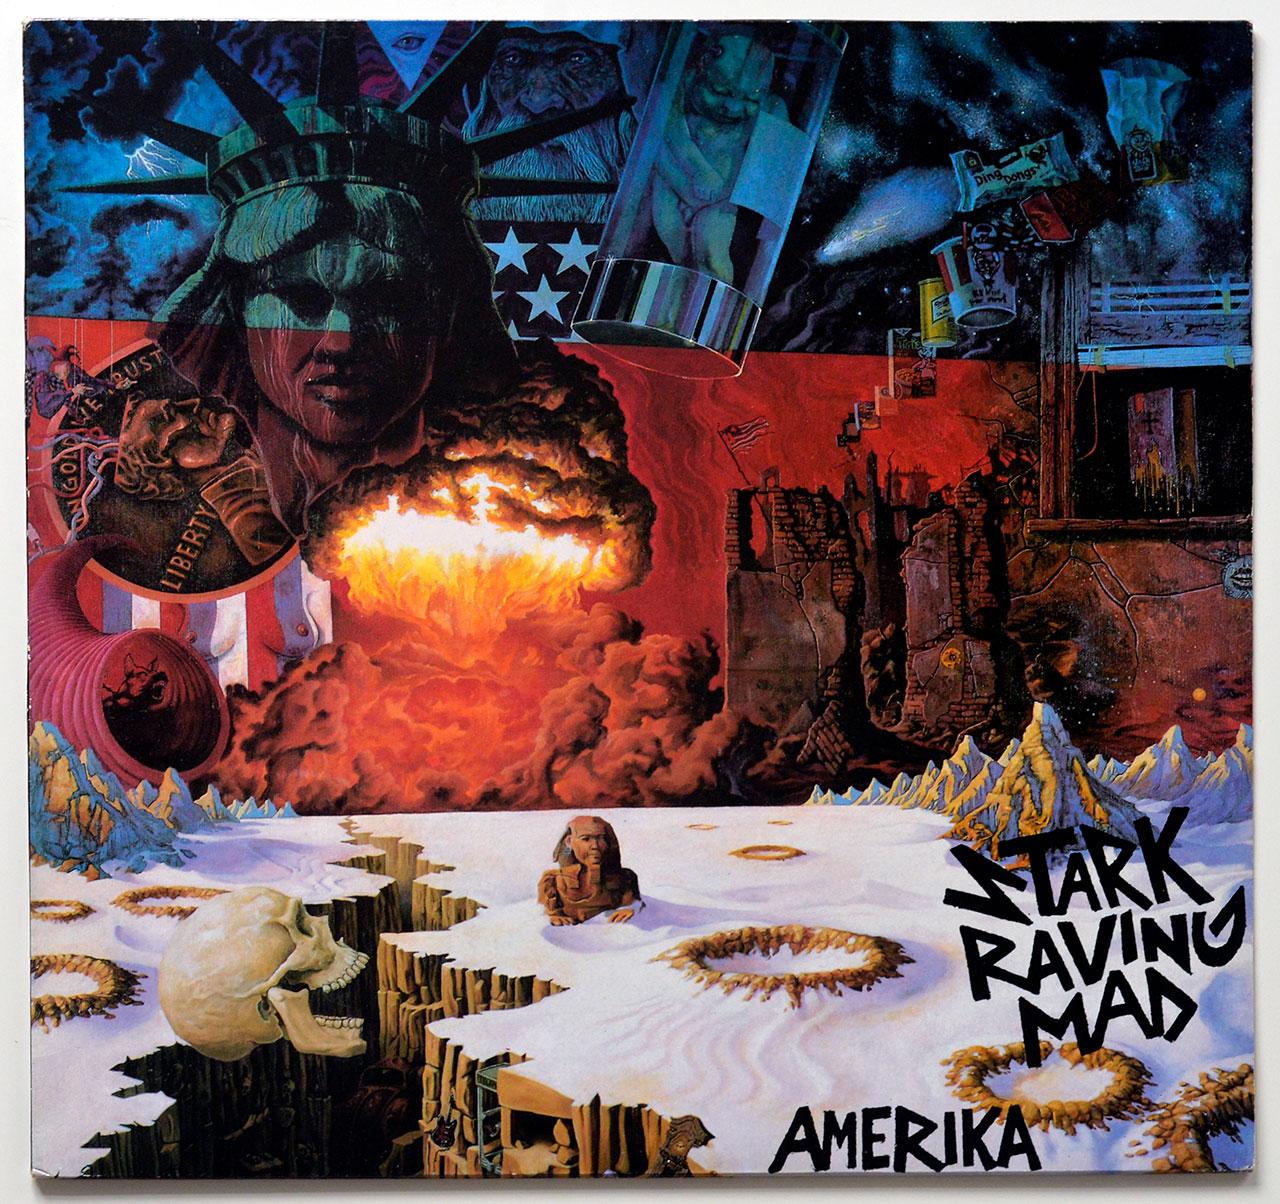 A0723 STARK RAVING MAD Amerika